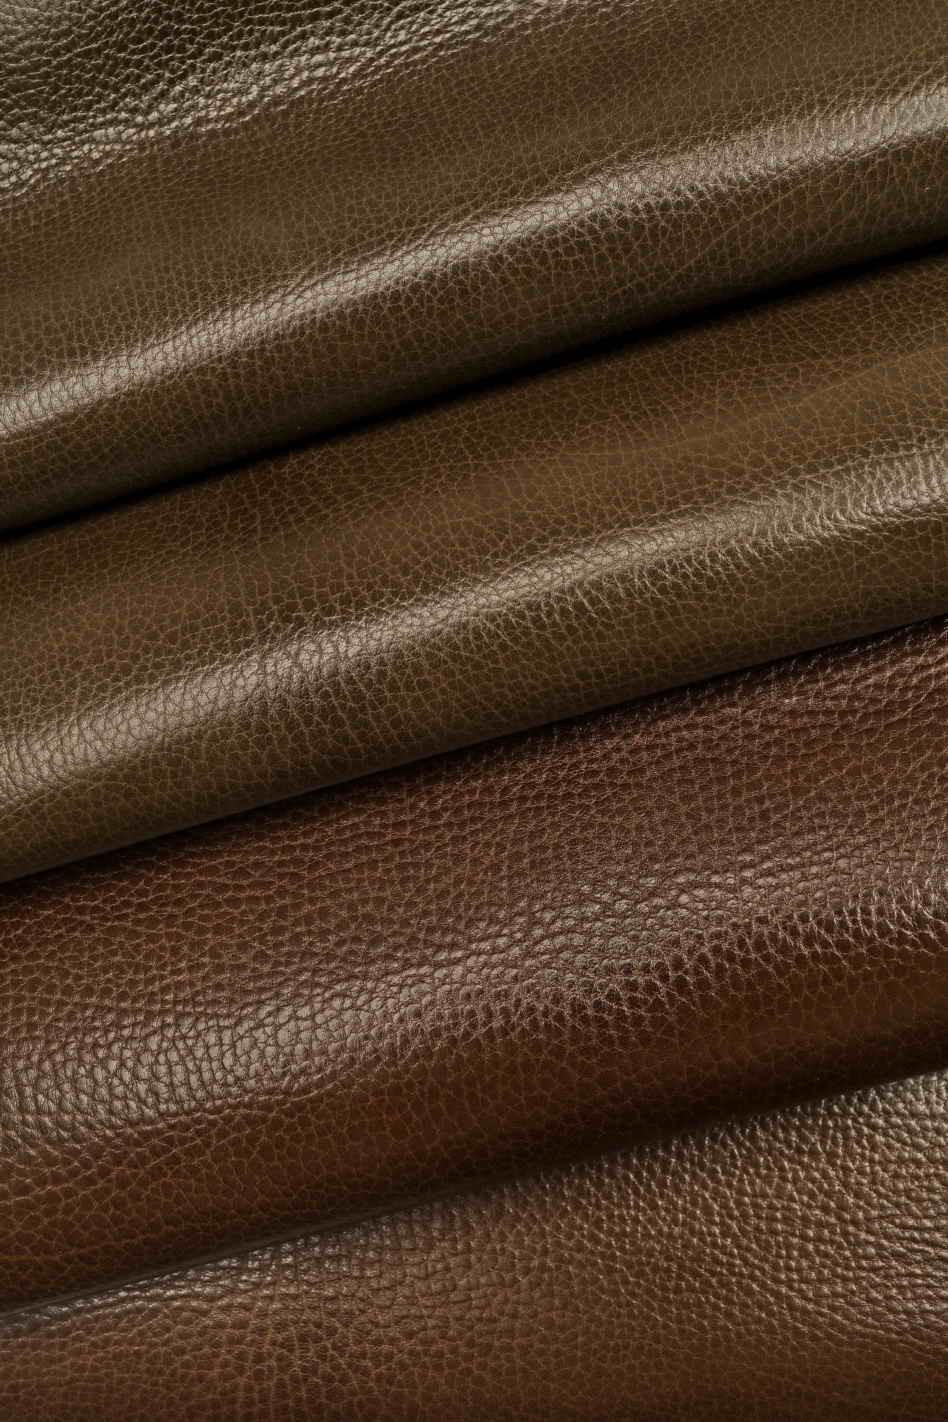 Thickness 0.7 mm A3959-TU La Garzarara sporty vintage looking Italian leather opaque dark brown half calf hides soft skin